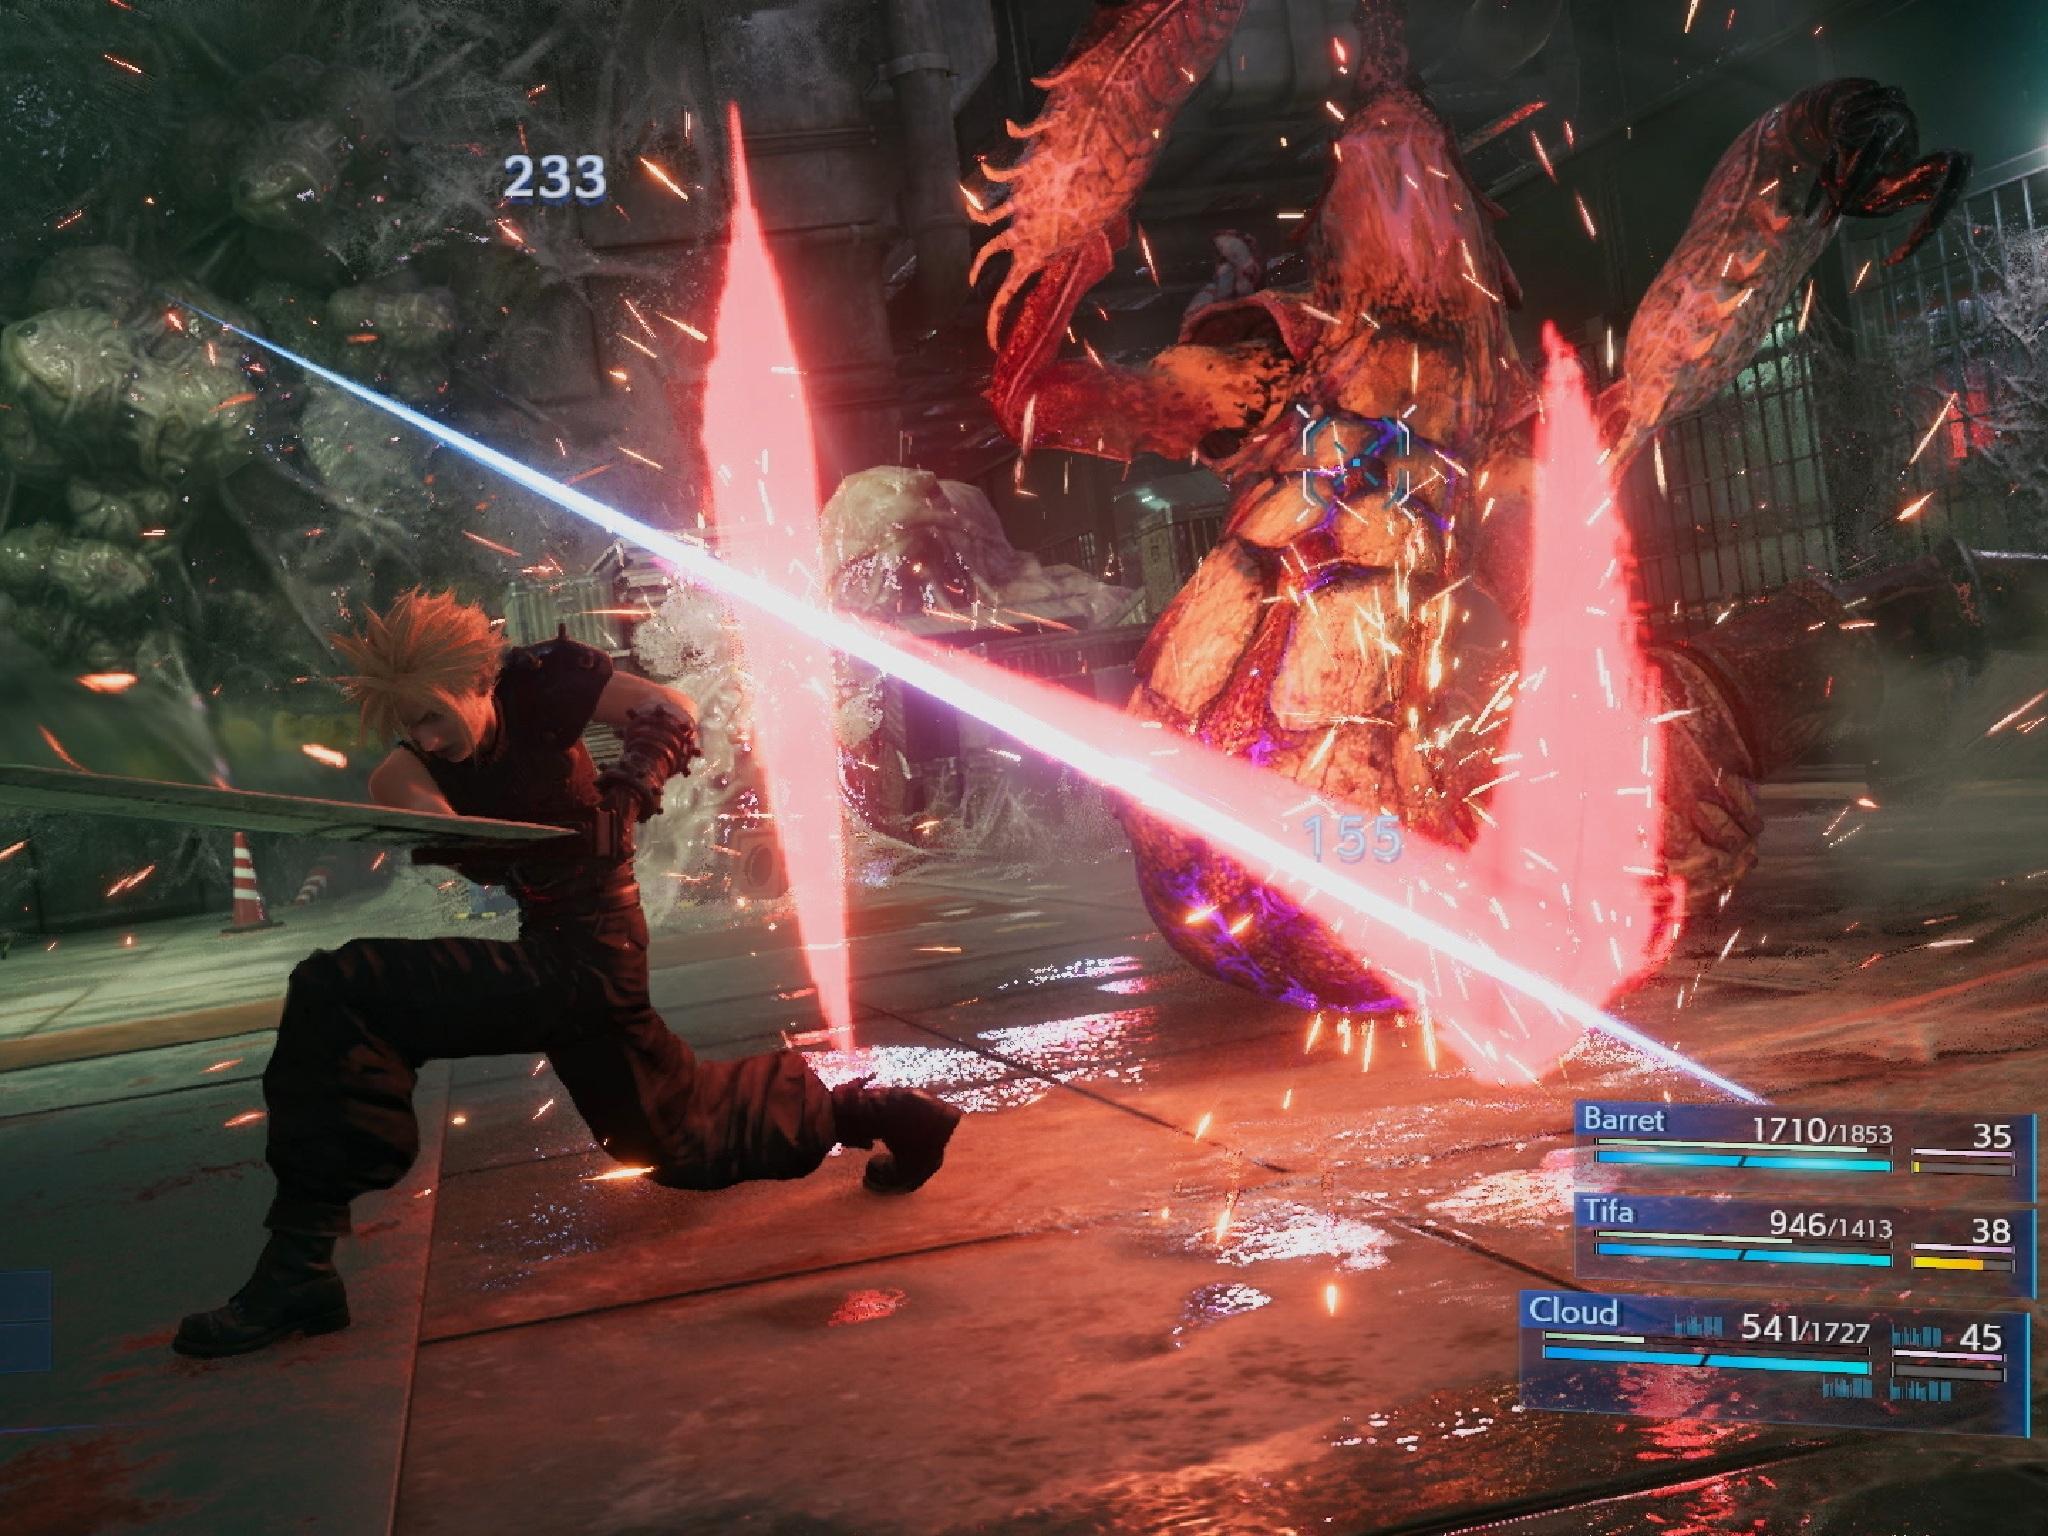 Jogos, VídeoJogos, Entretenimento, Final Fantasy VII Remake (2020)